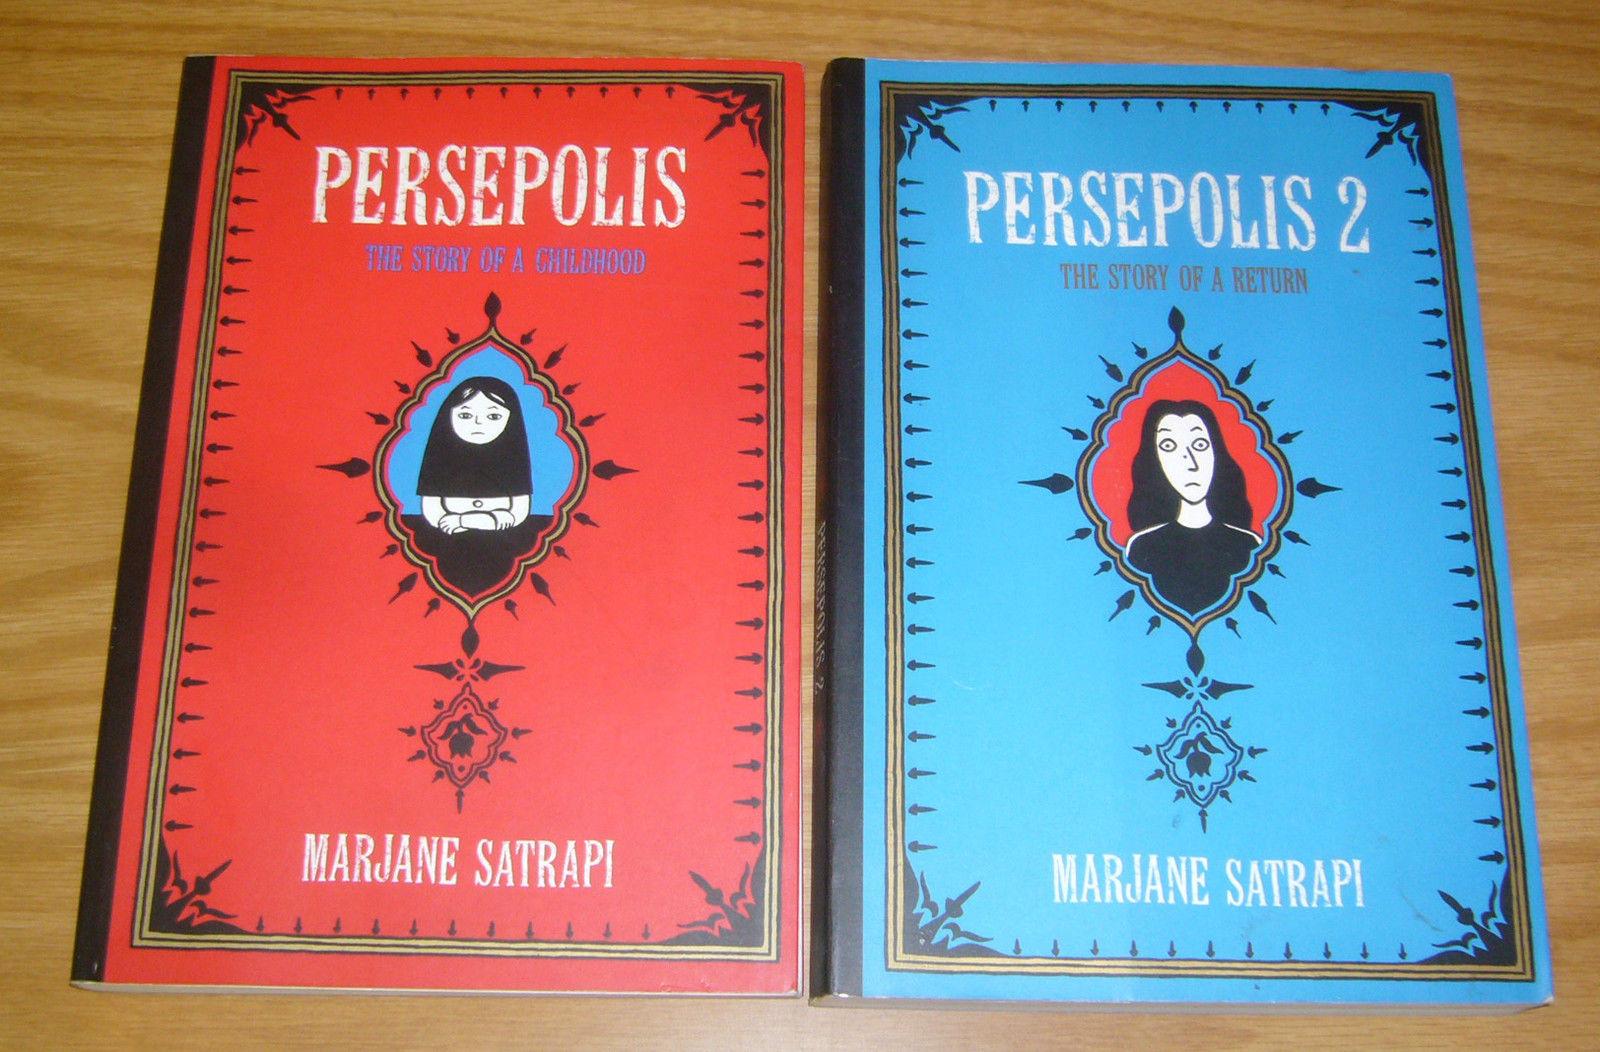 Persepolis Ogn 1 2 Vf Nm Complete Series Islamic Revolution Marjane Satrapi Set Hipcomic